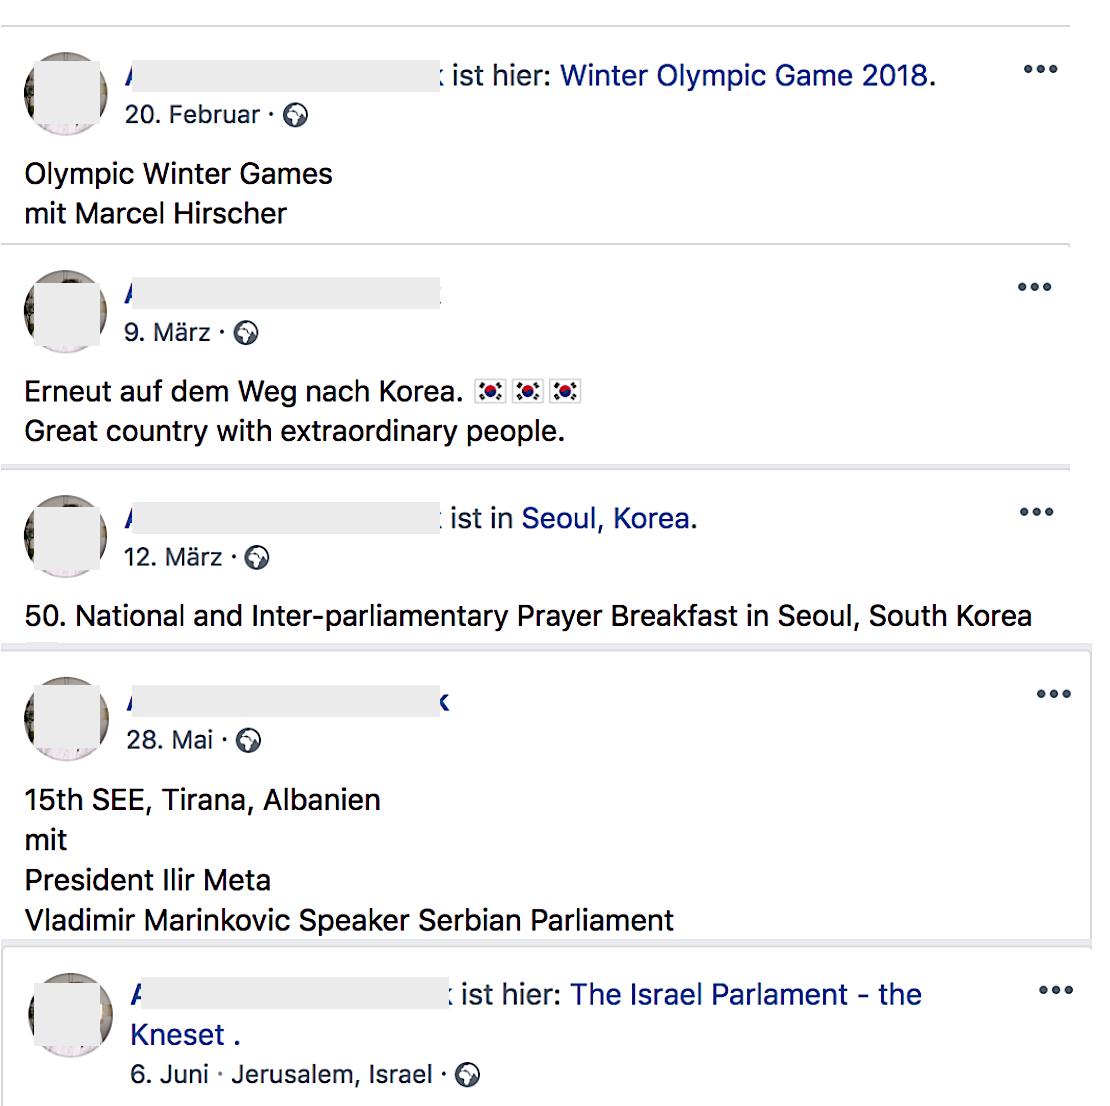 Reise des FPÖ-Ex-Abgeordnenten (Screenshots Facebook, Juni 2018)